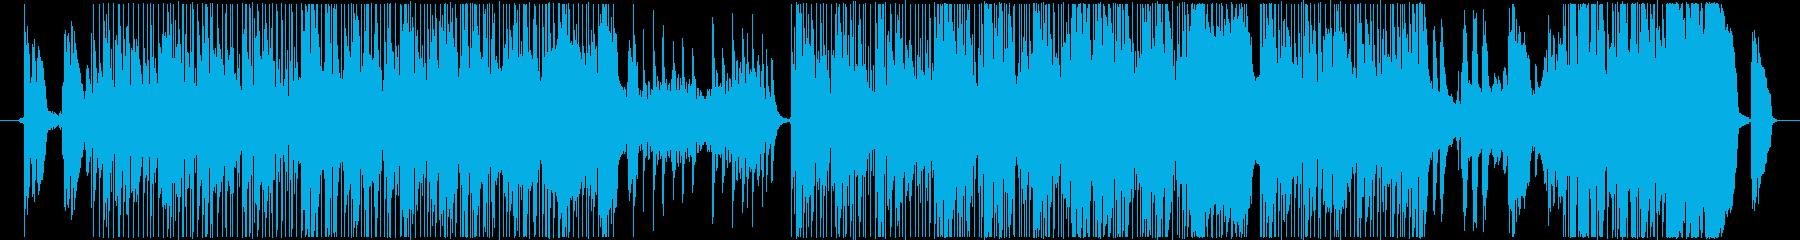 C-POPなギター曲の再生済みの波形